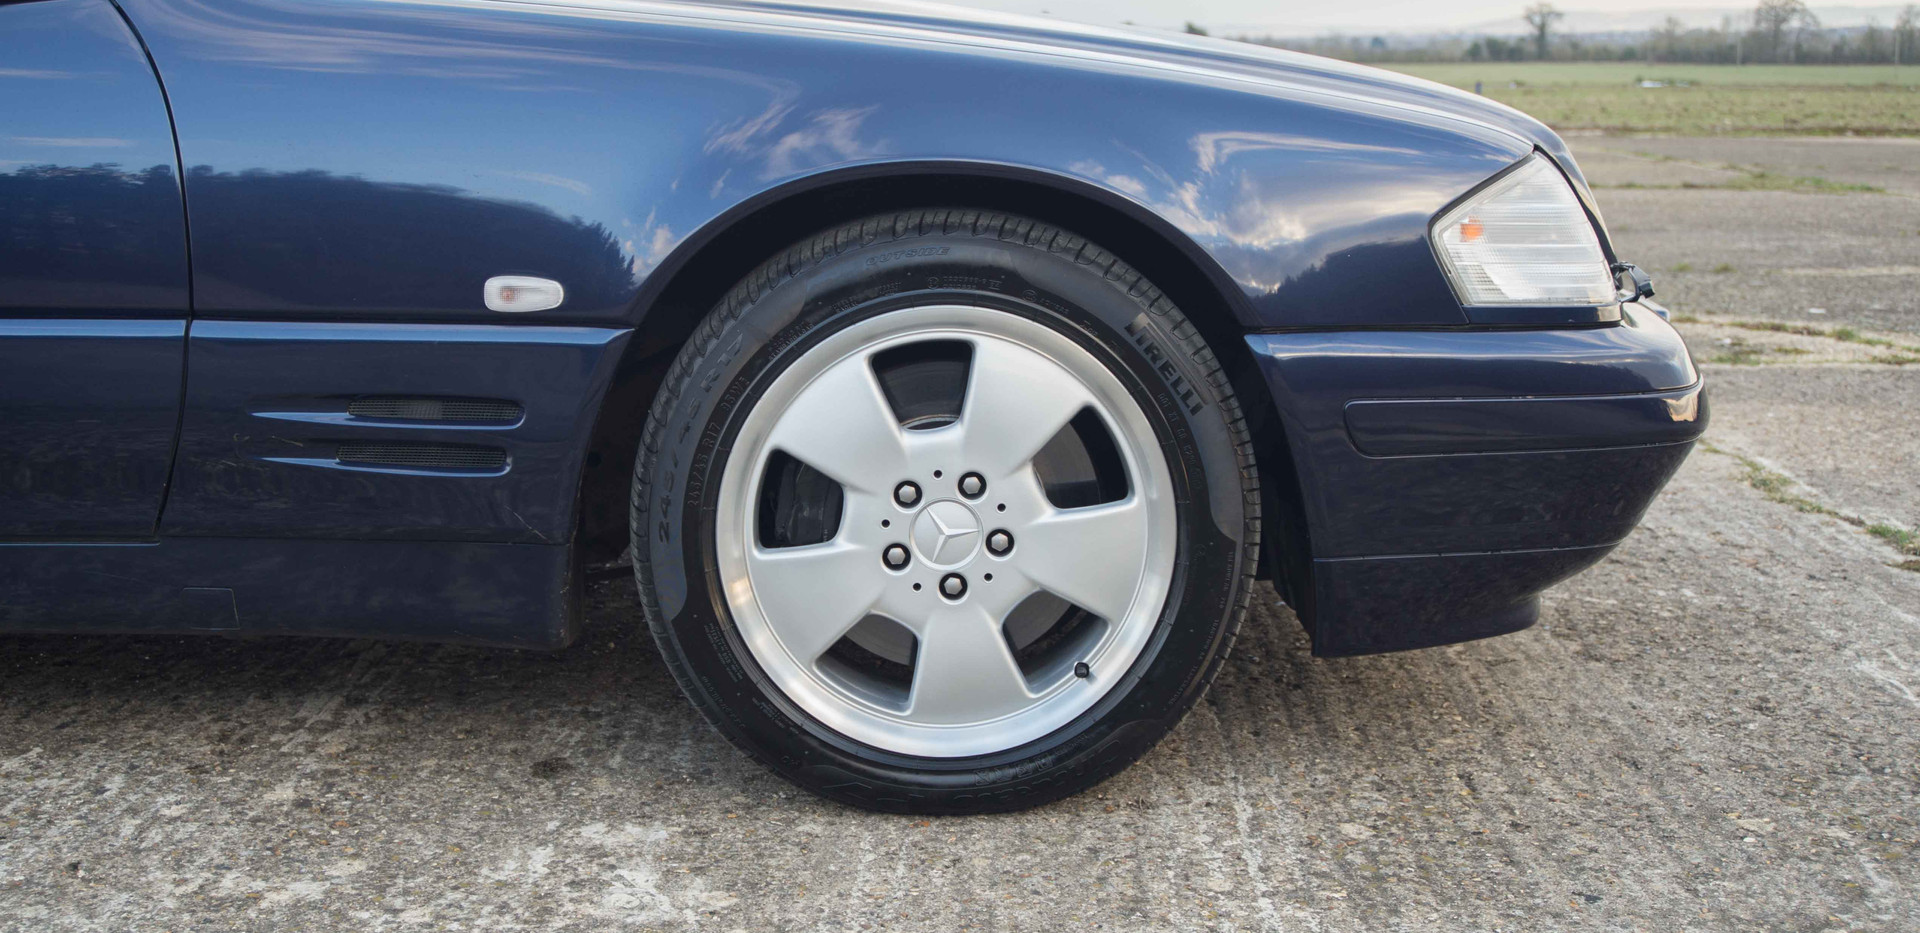 SL500 For Sale UK London  (17 of 36).jpg